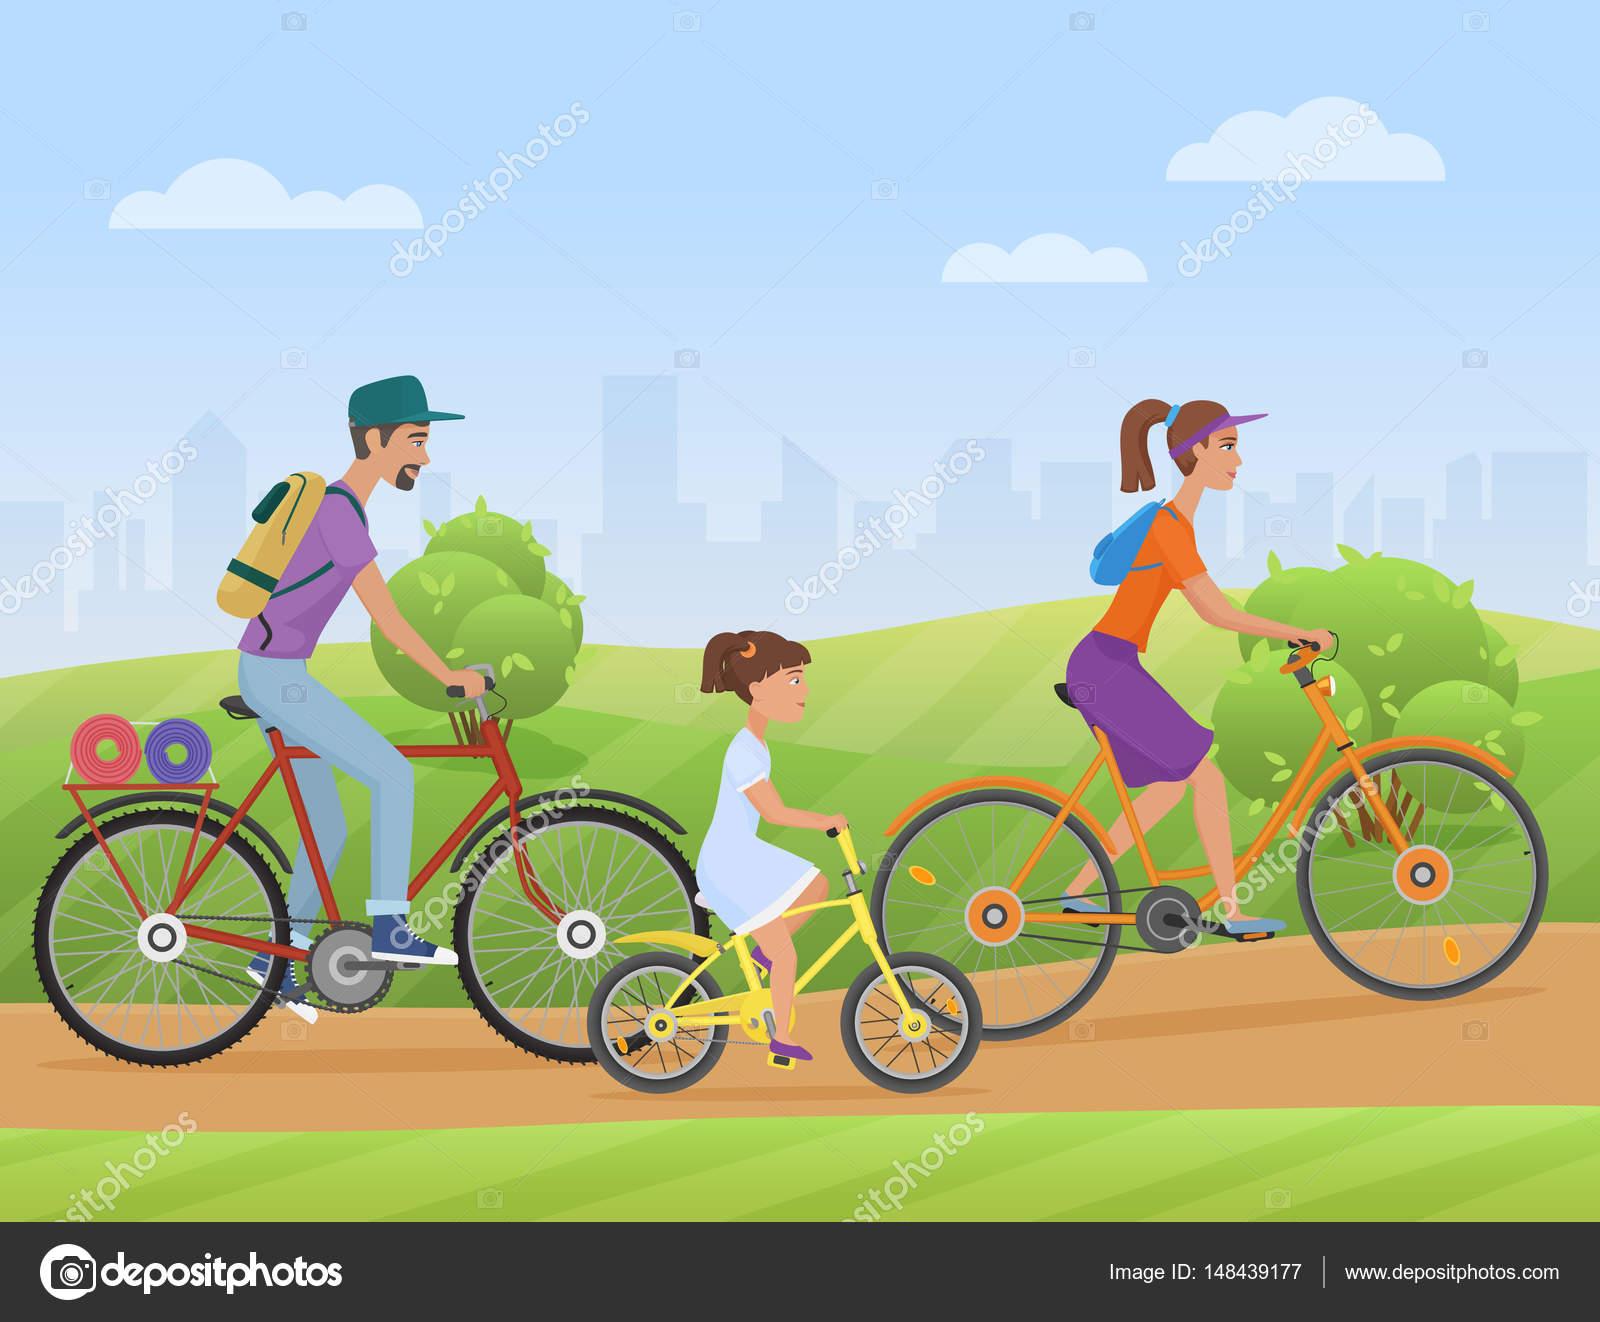 Niña Montando Su Bicicleta En Un Parque: Familia Con Niño Niña Montando Una Bicicleta En La